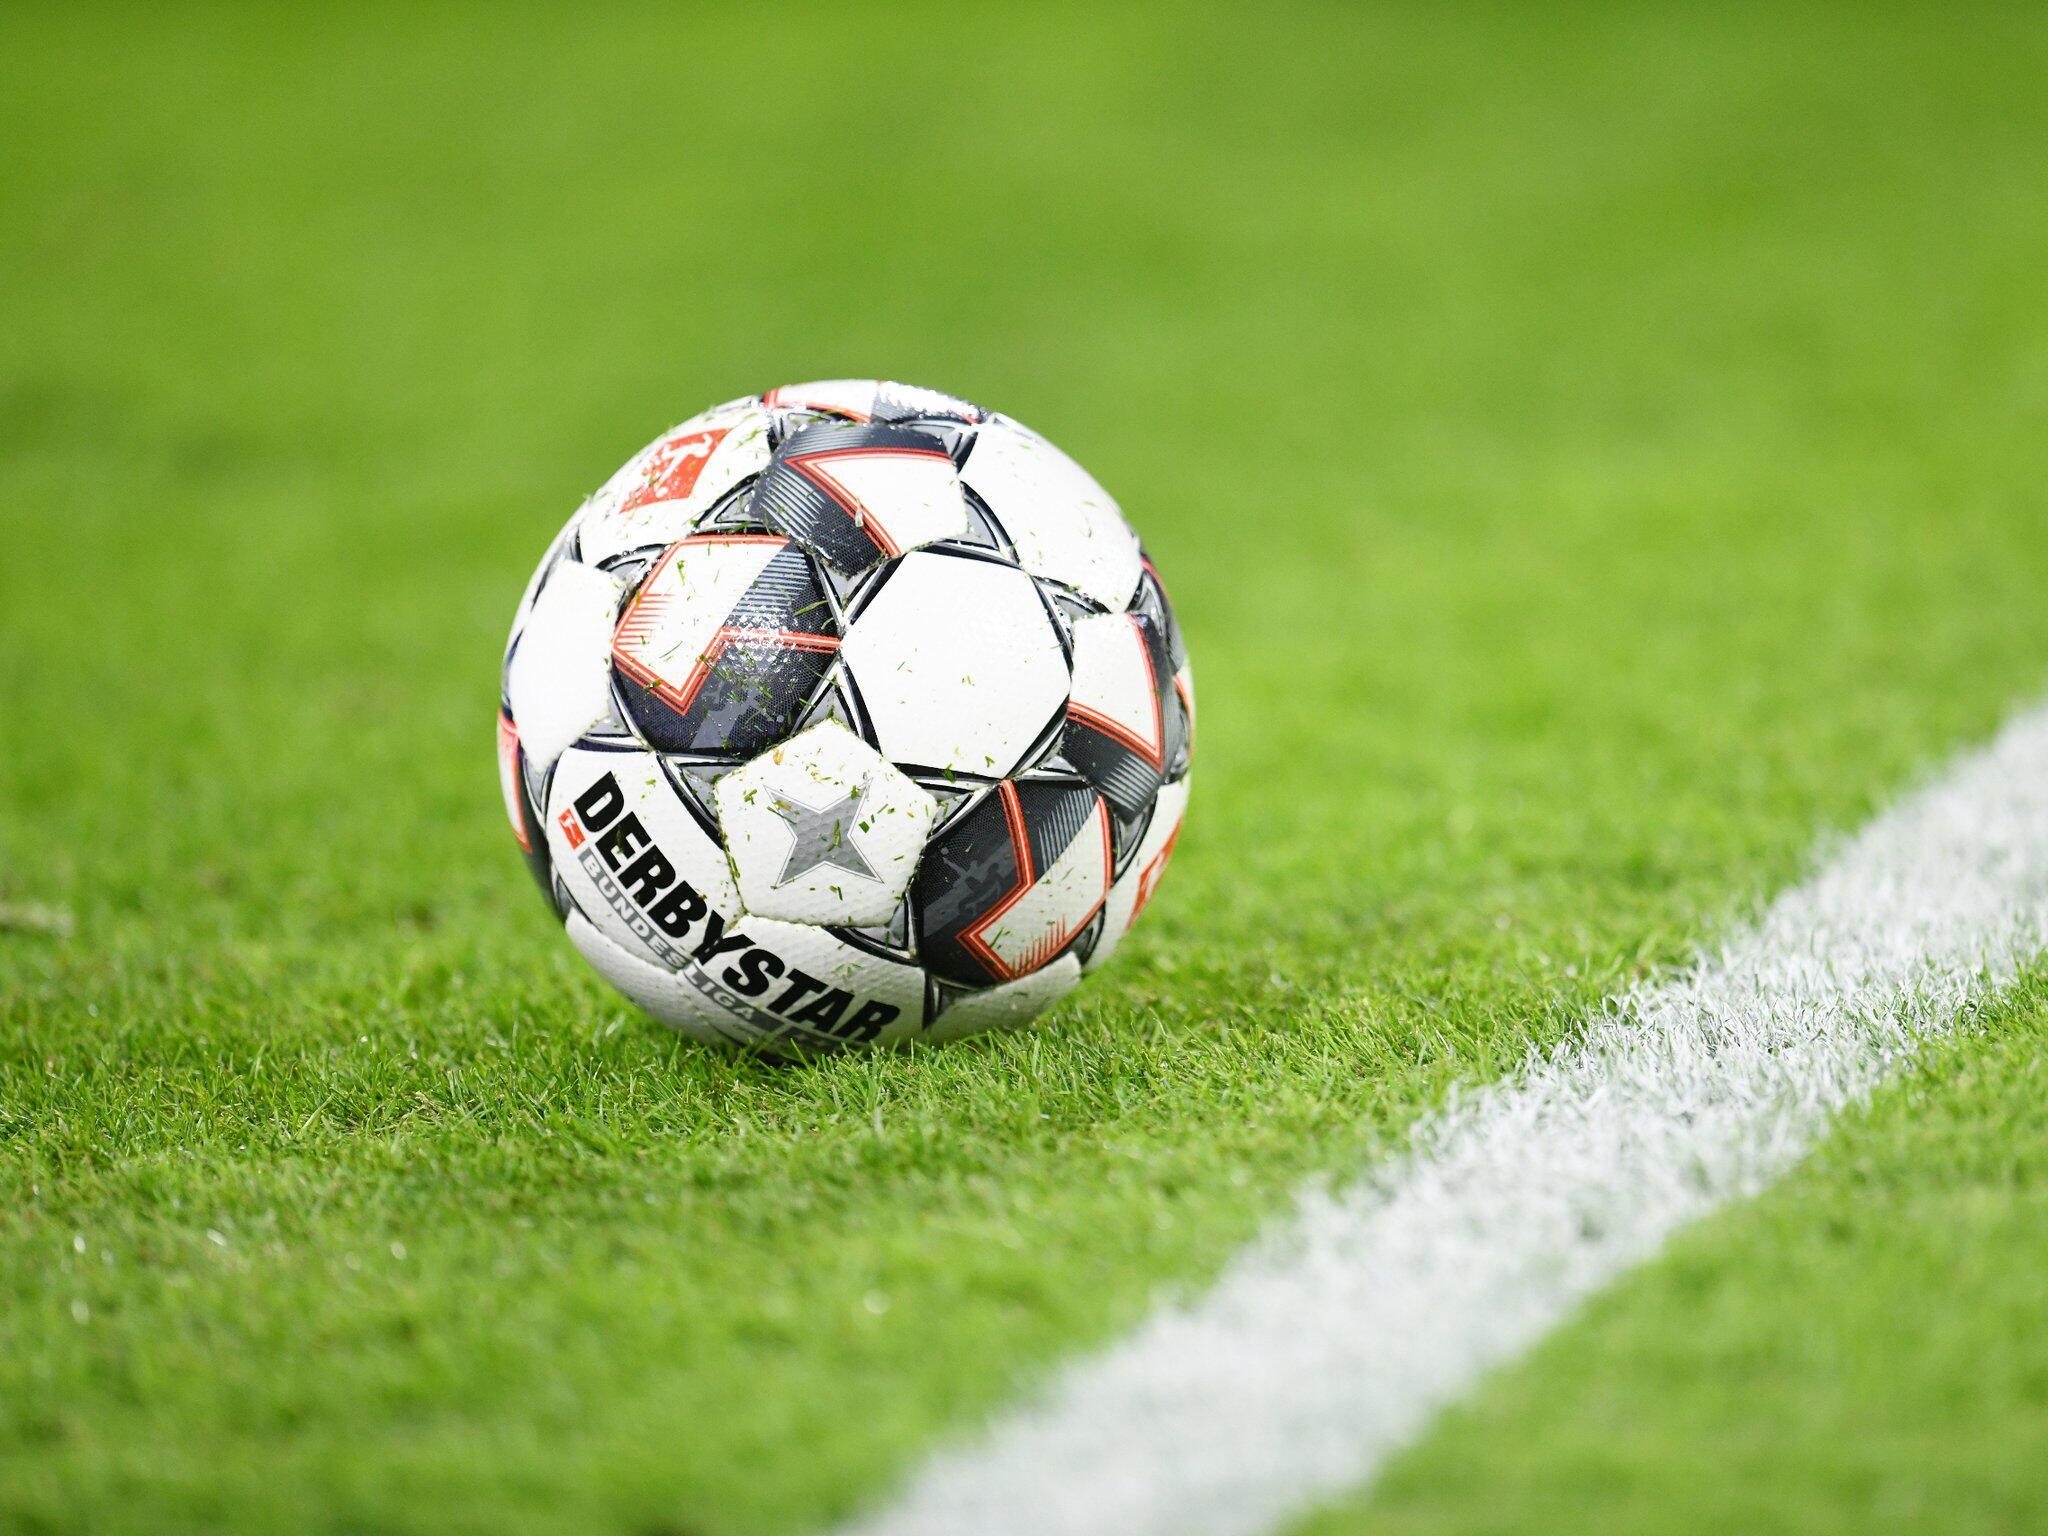 Fussball nurnberg heute live